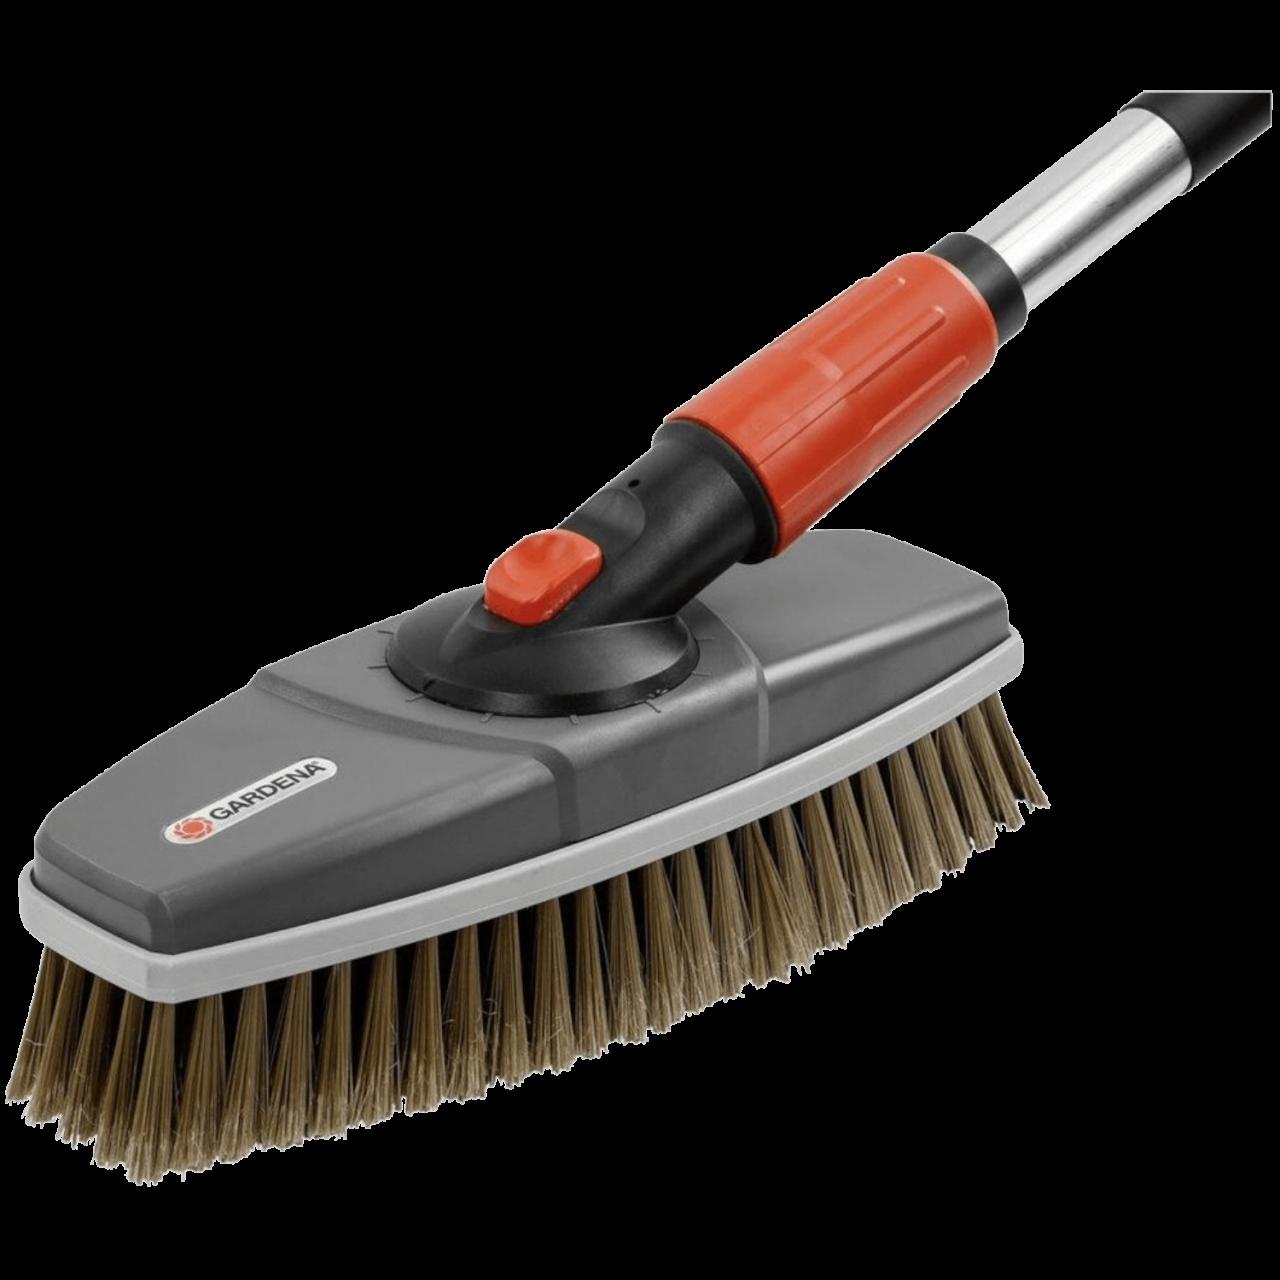 Gardena 5580-20 Cleansystem-Autowasch-Set